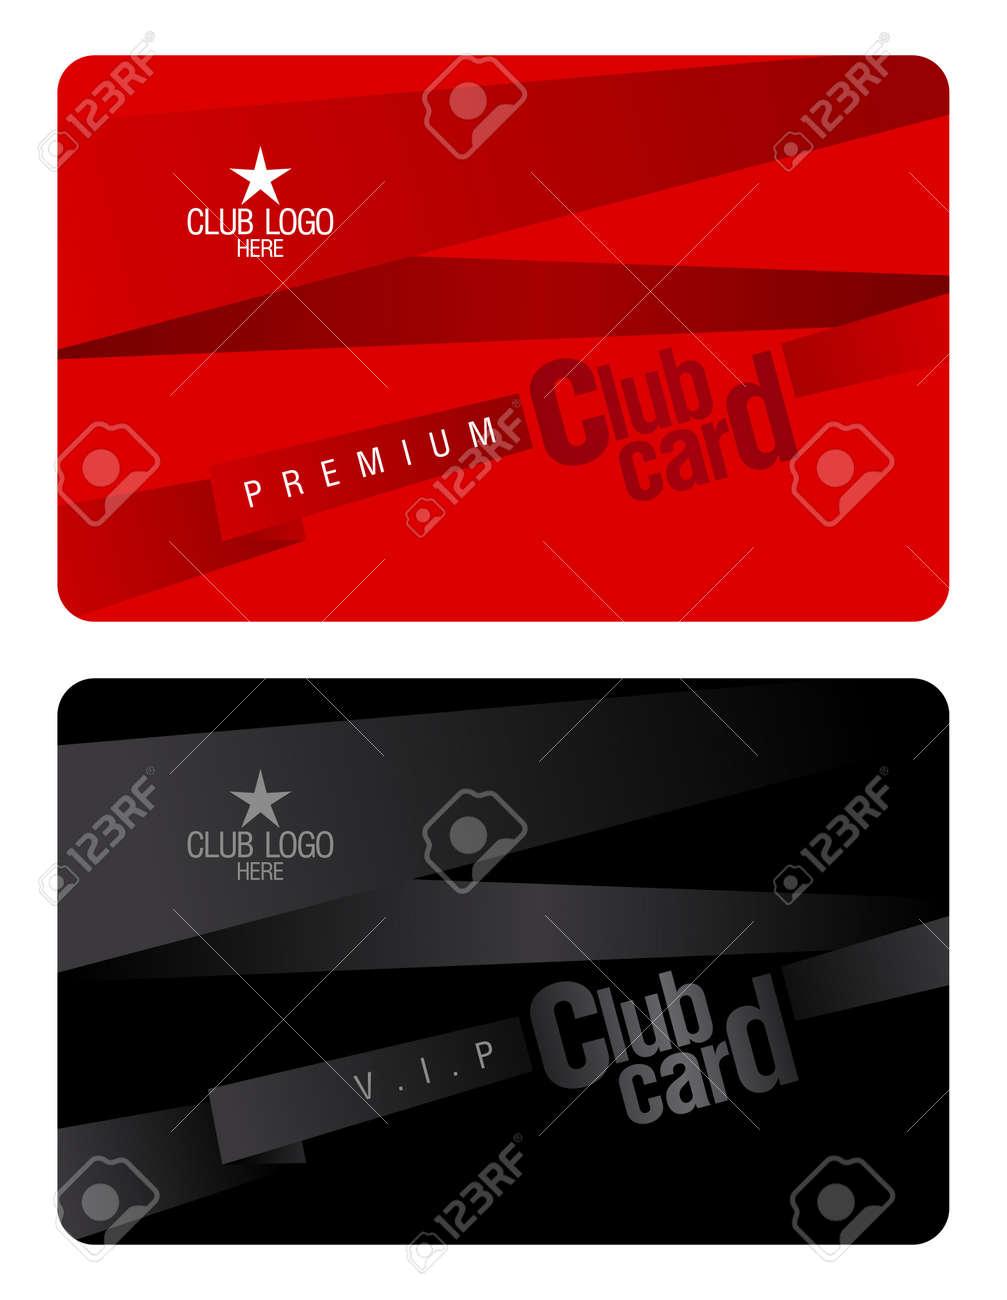 Membership Card Template Word sample cash receipt – Club Membership Card Template